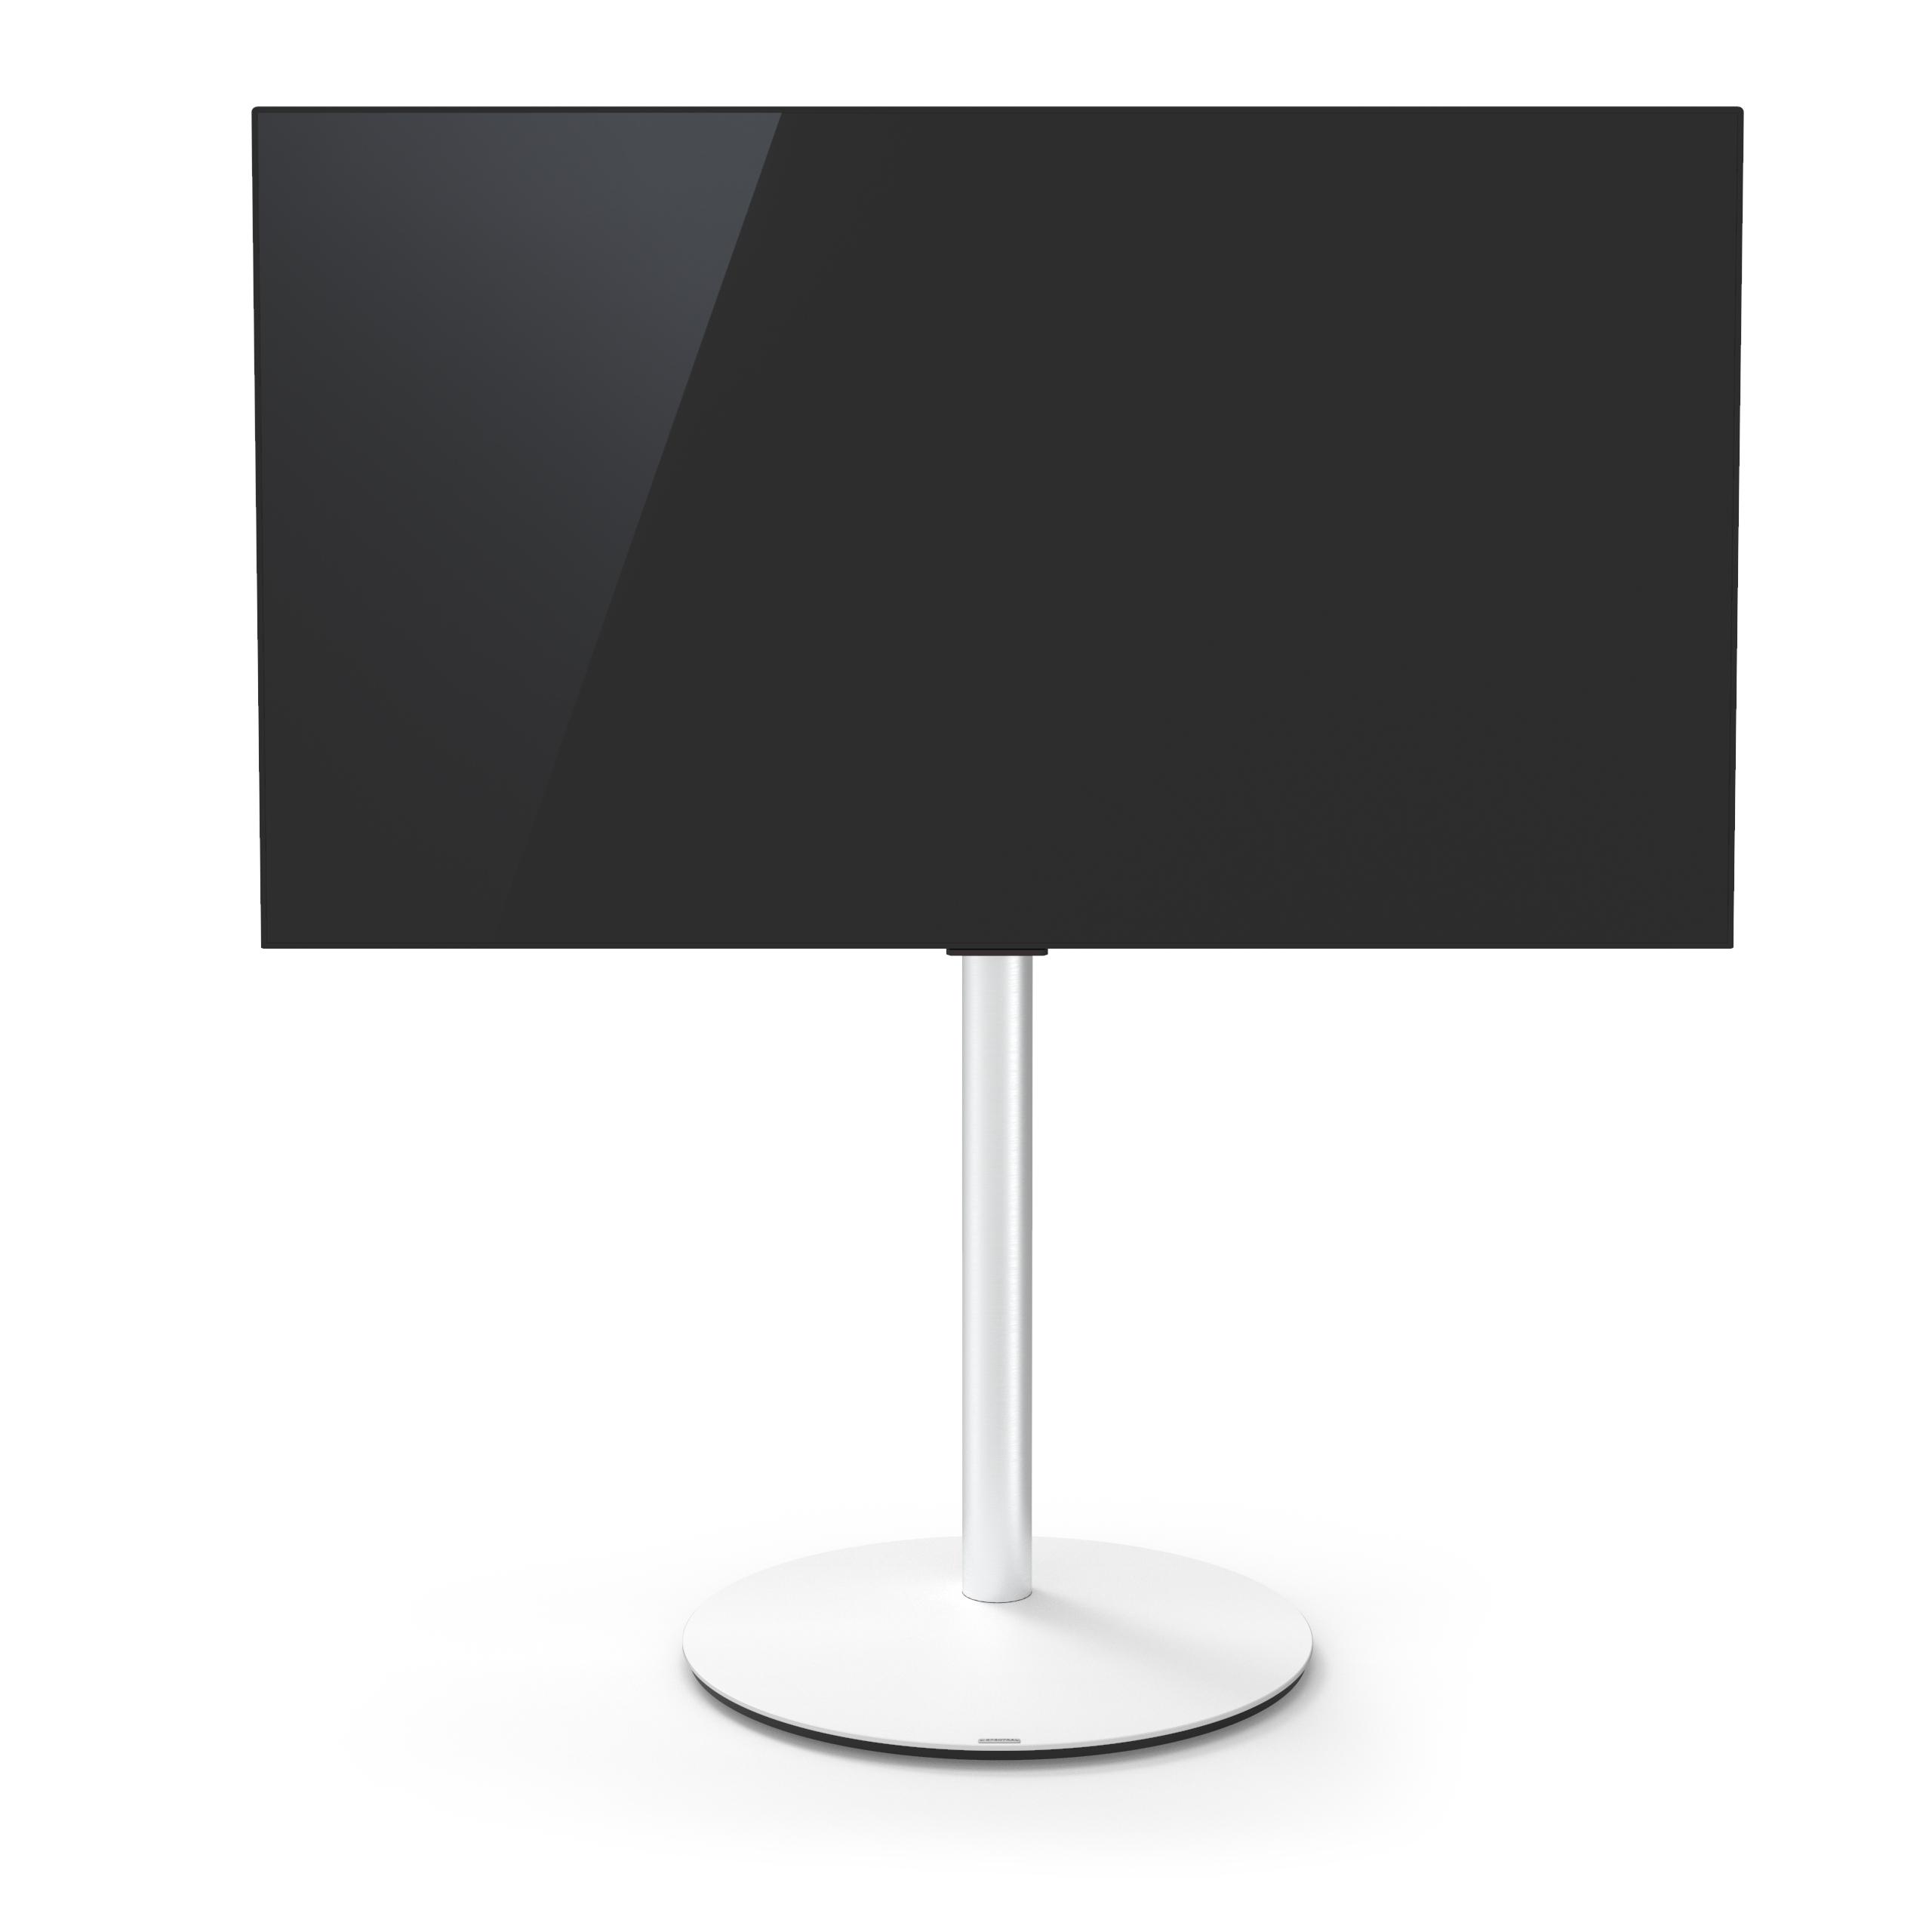 VX1000 draaibare tv-standaard, wit glas, aluminium buis